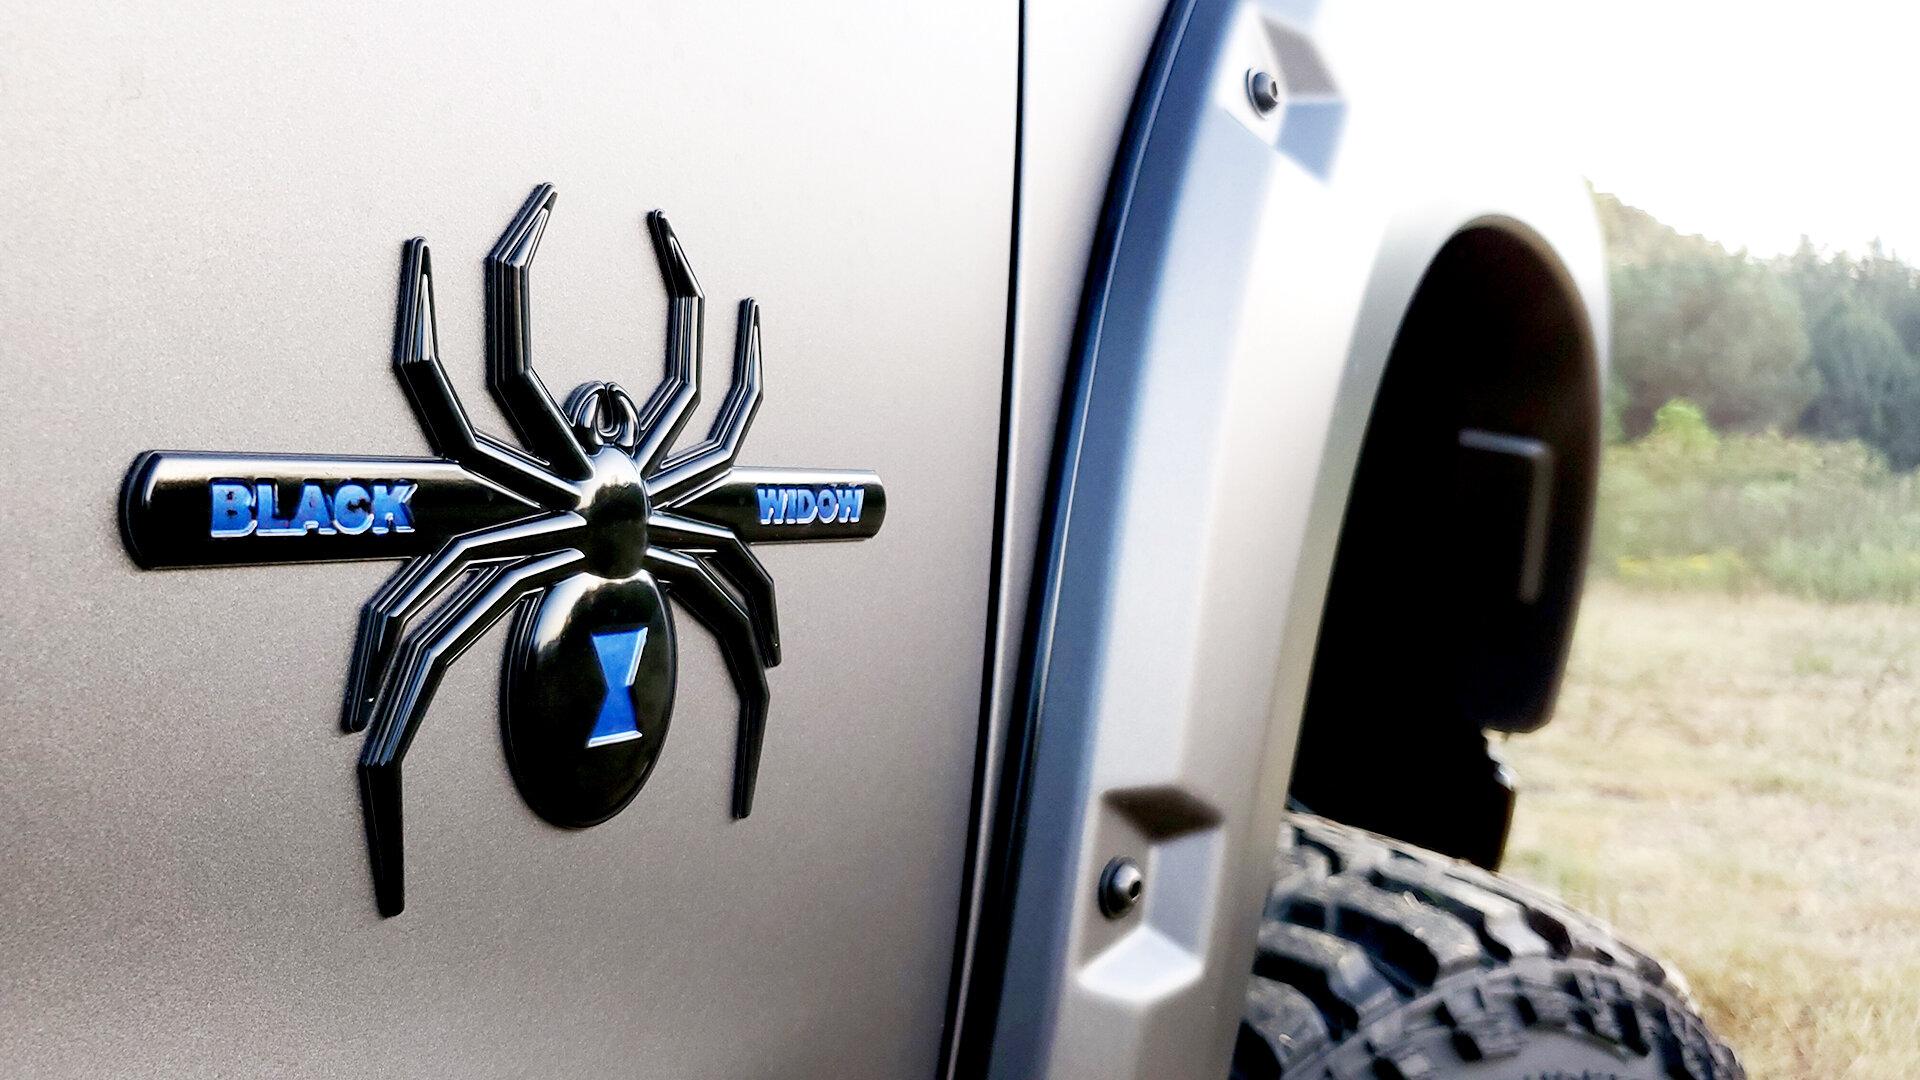 SCA 40th Chevy Black Widow Pside Badge2_edit.jpg